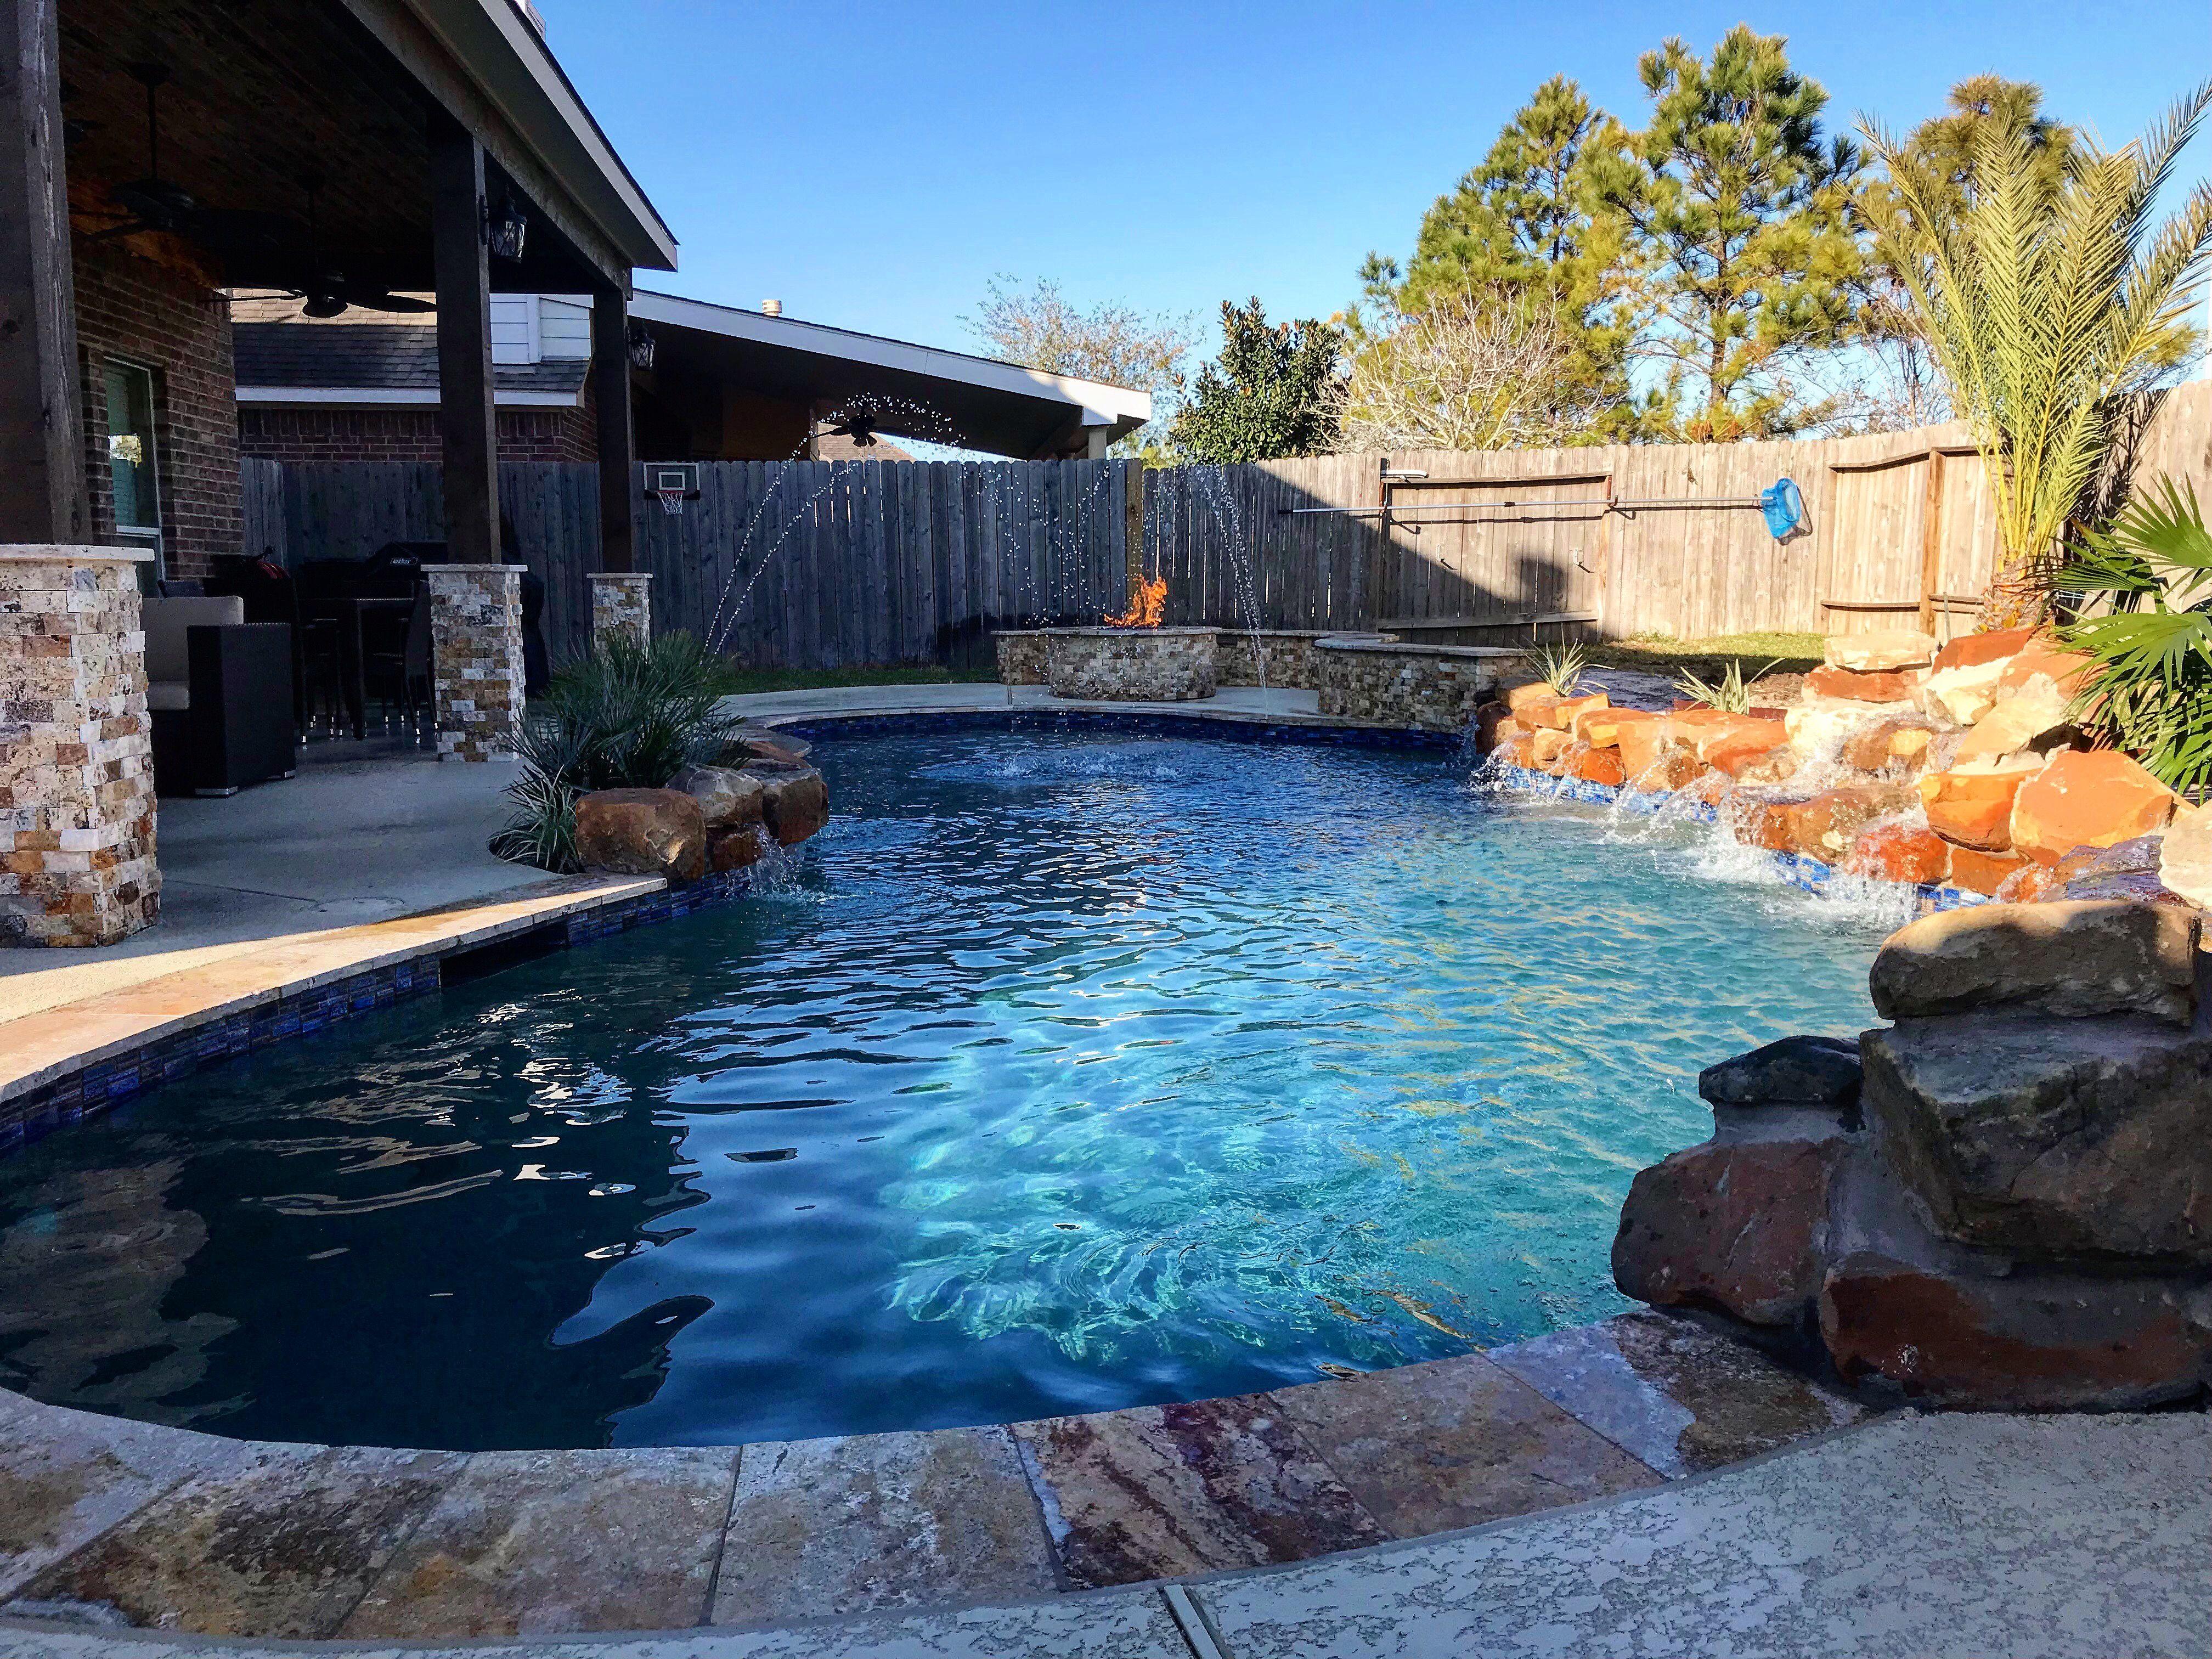 Premier Pools And Spas Houston Texas Custom Pool With Seating